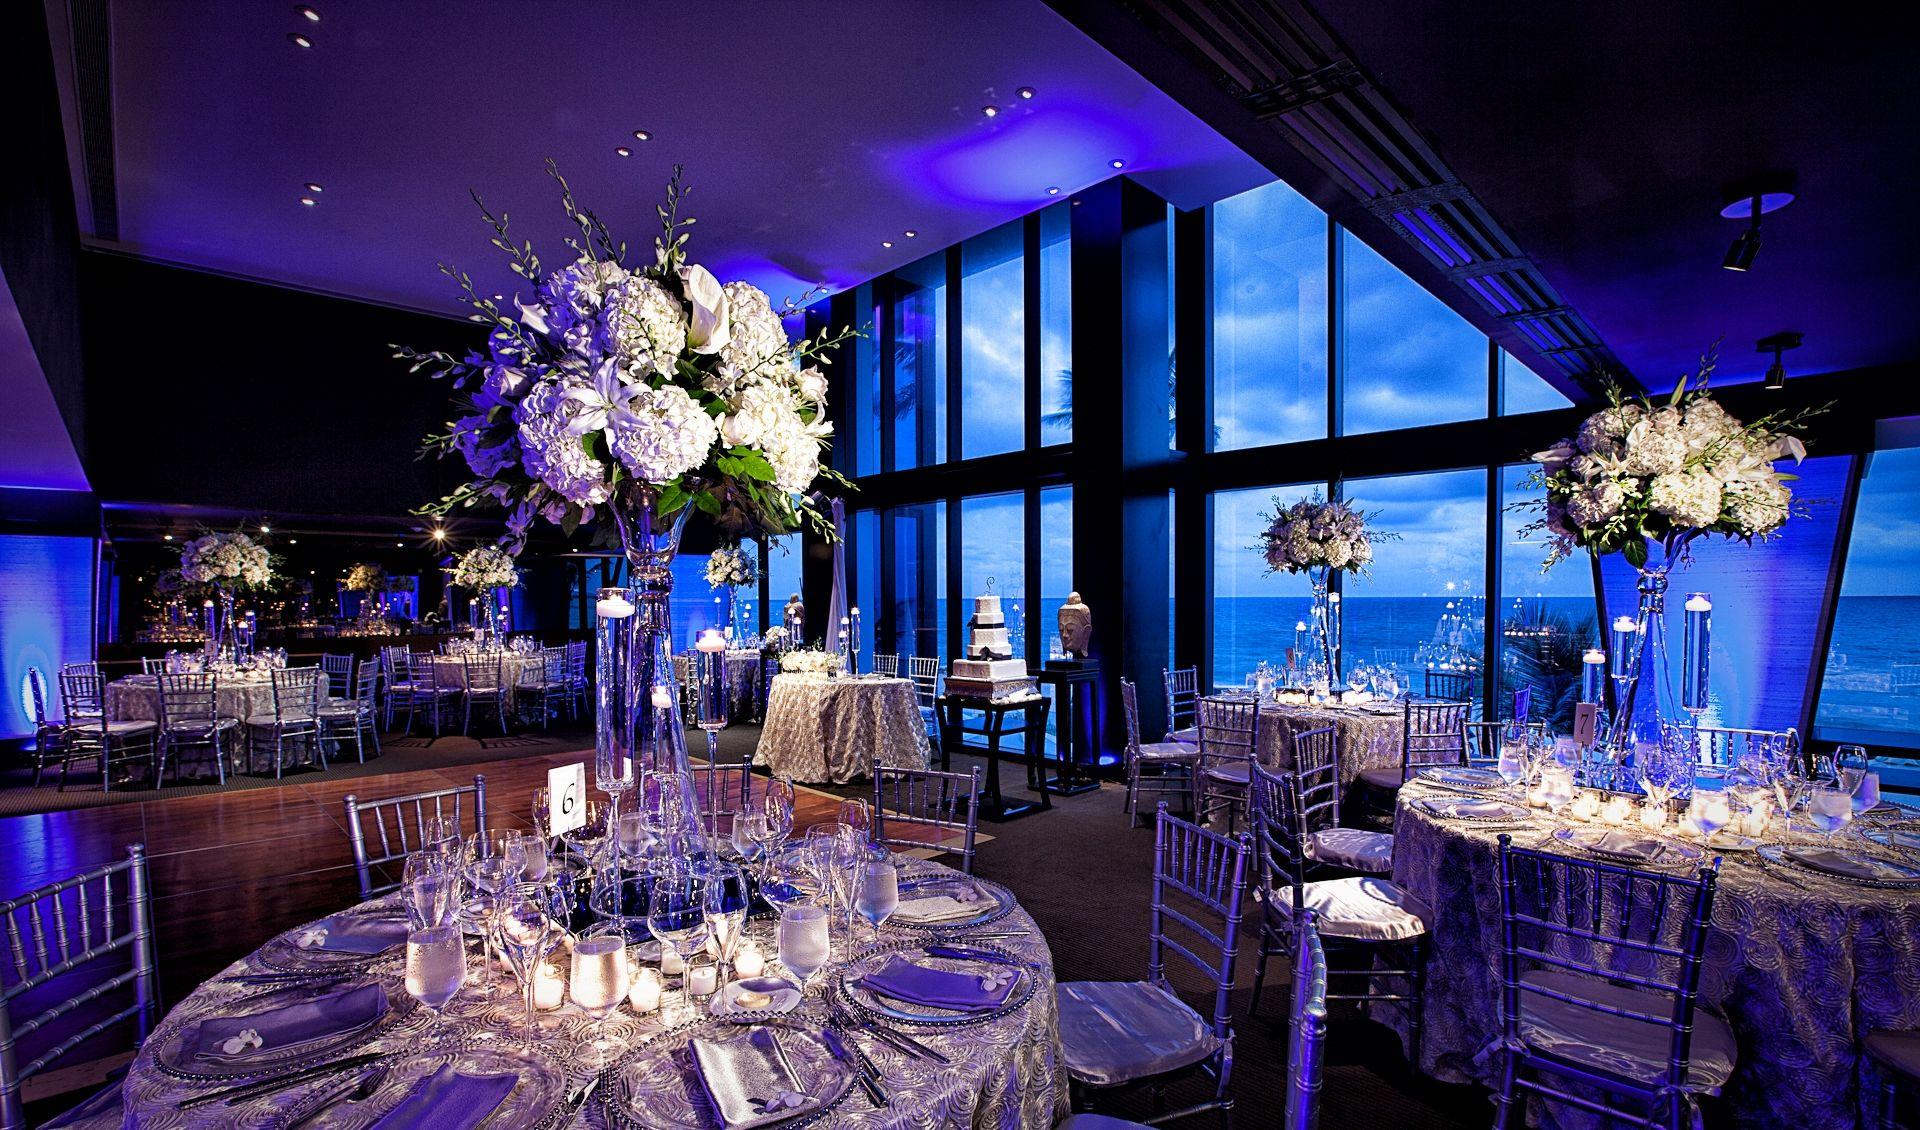 Tideline Resort California wedding venues, Beautiful